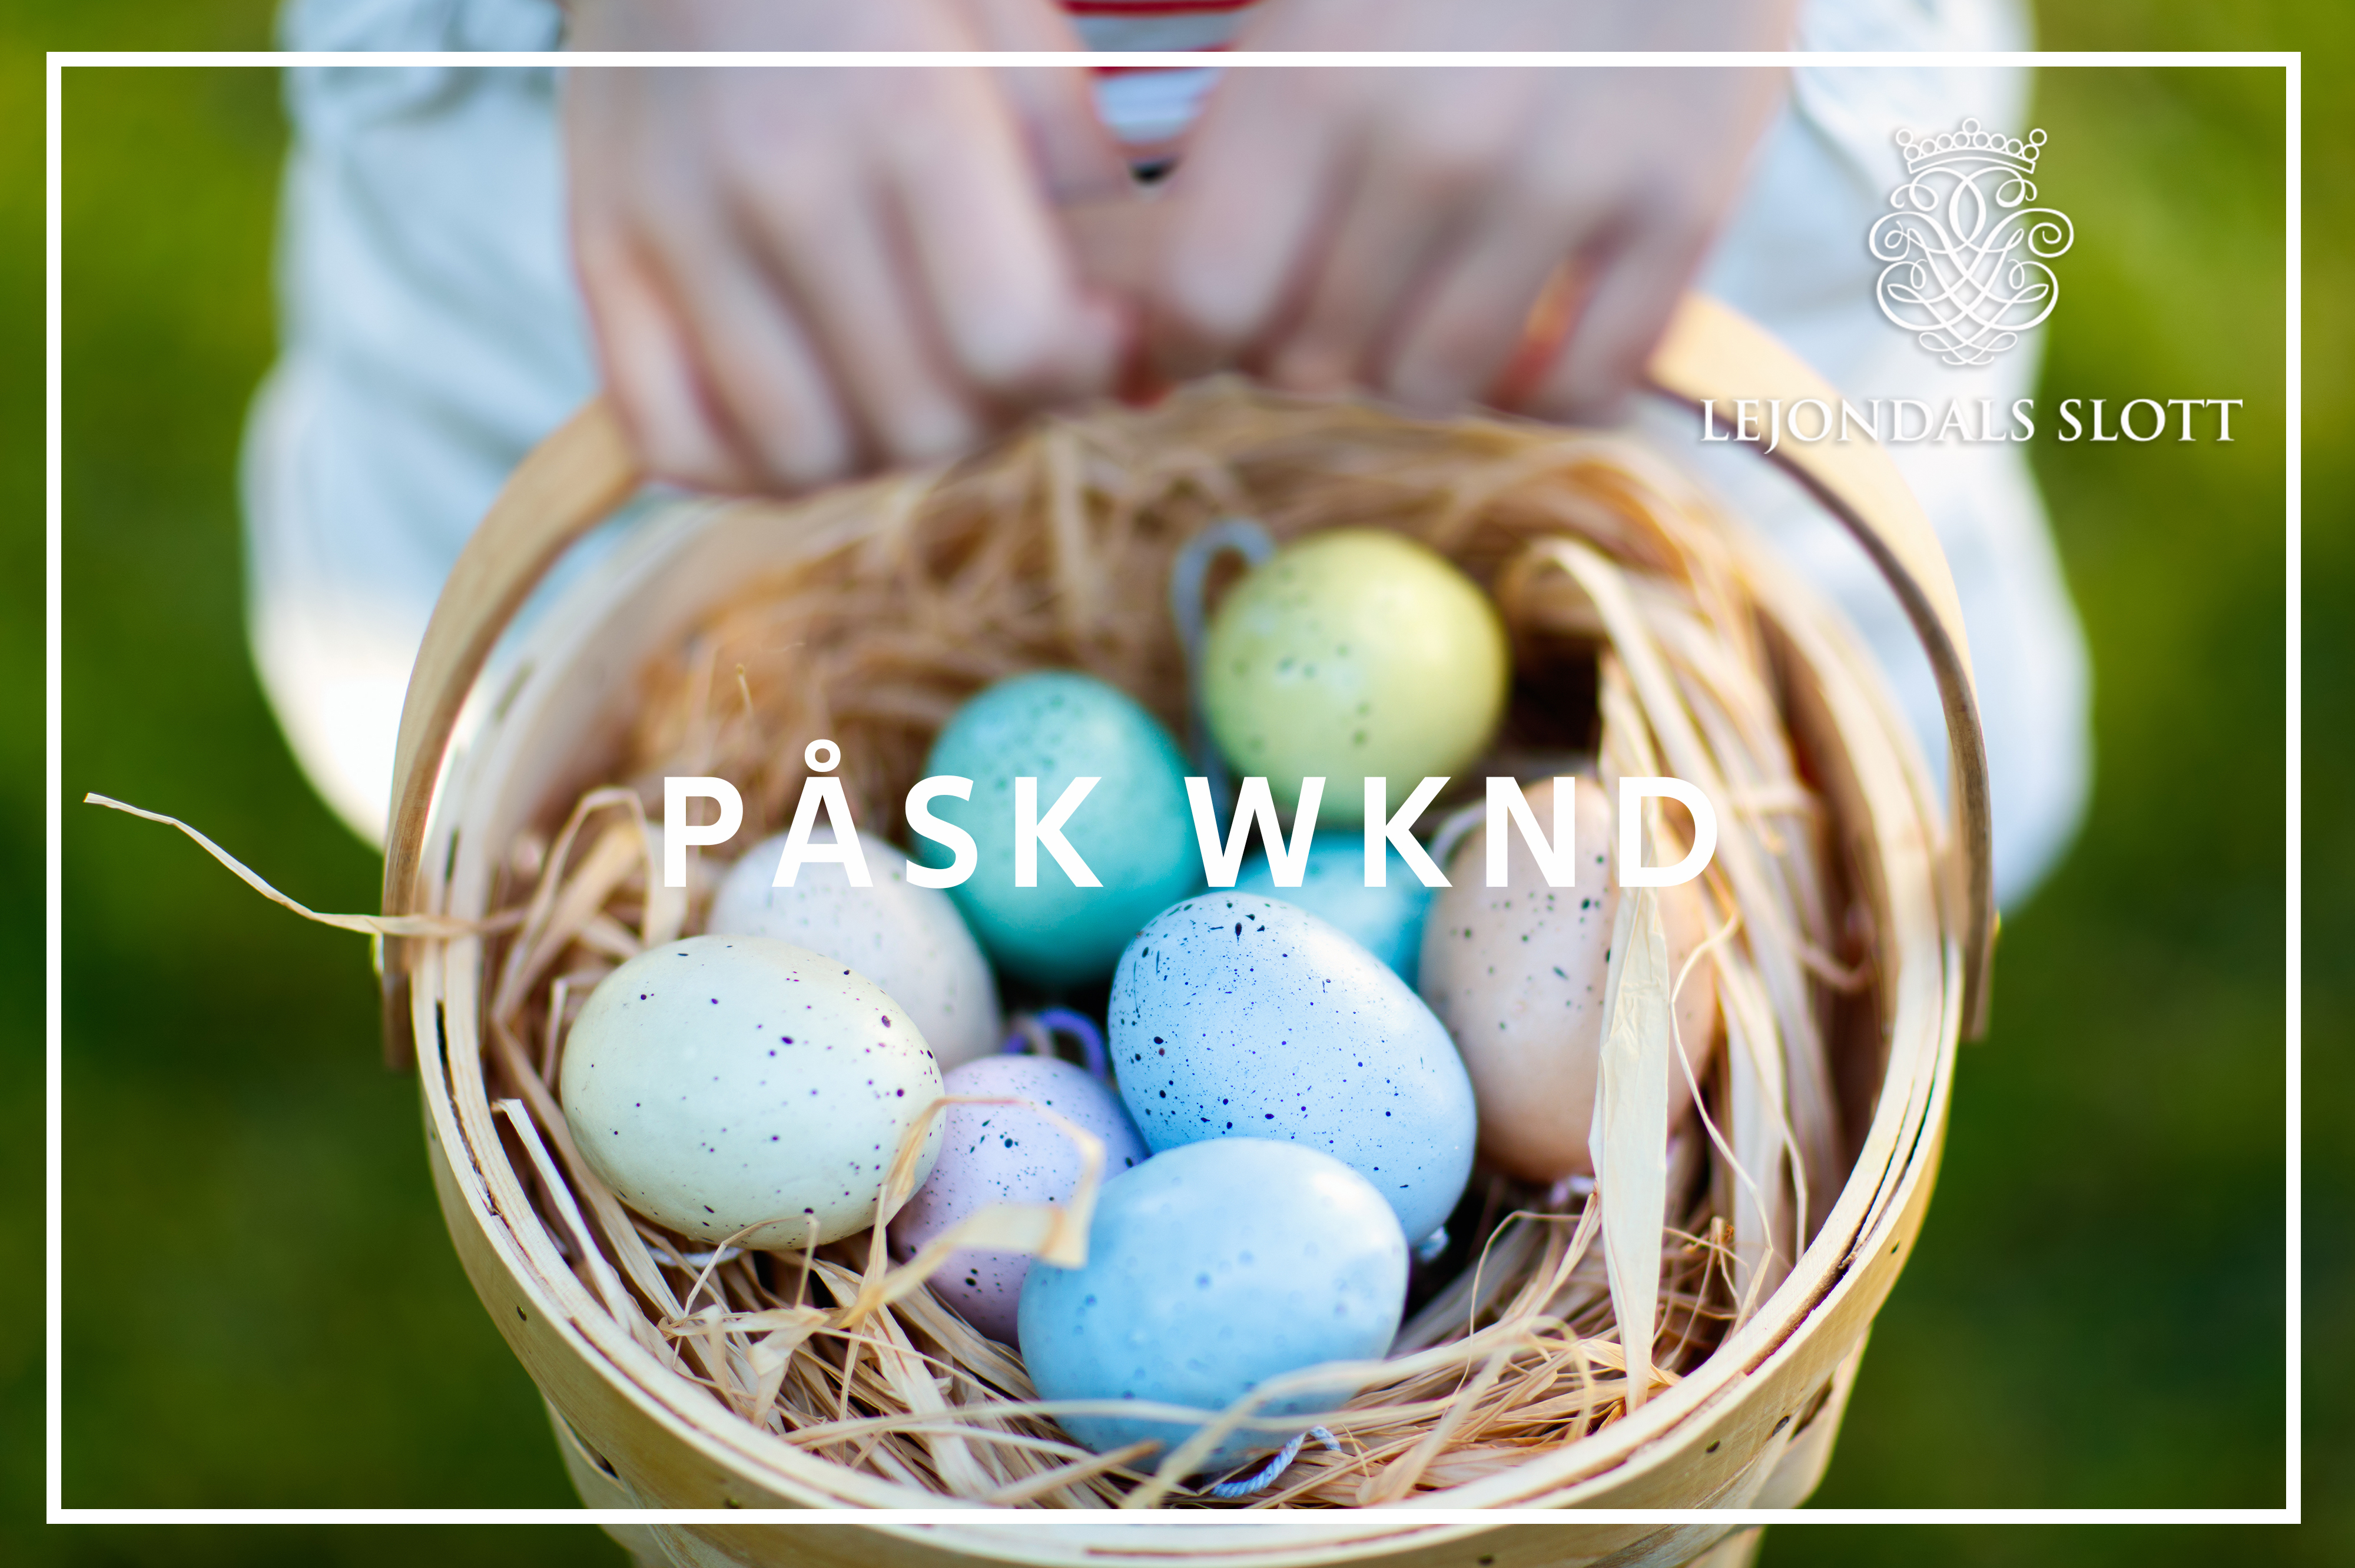 Easter WKND